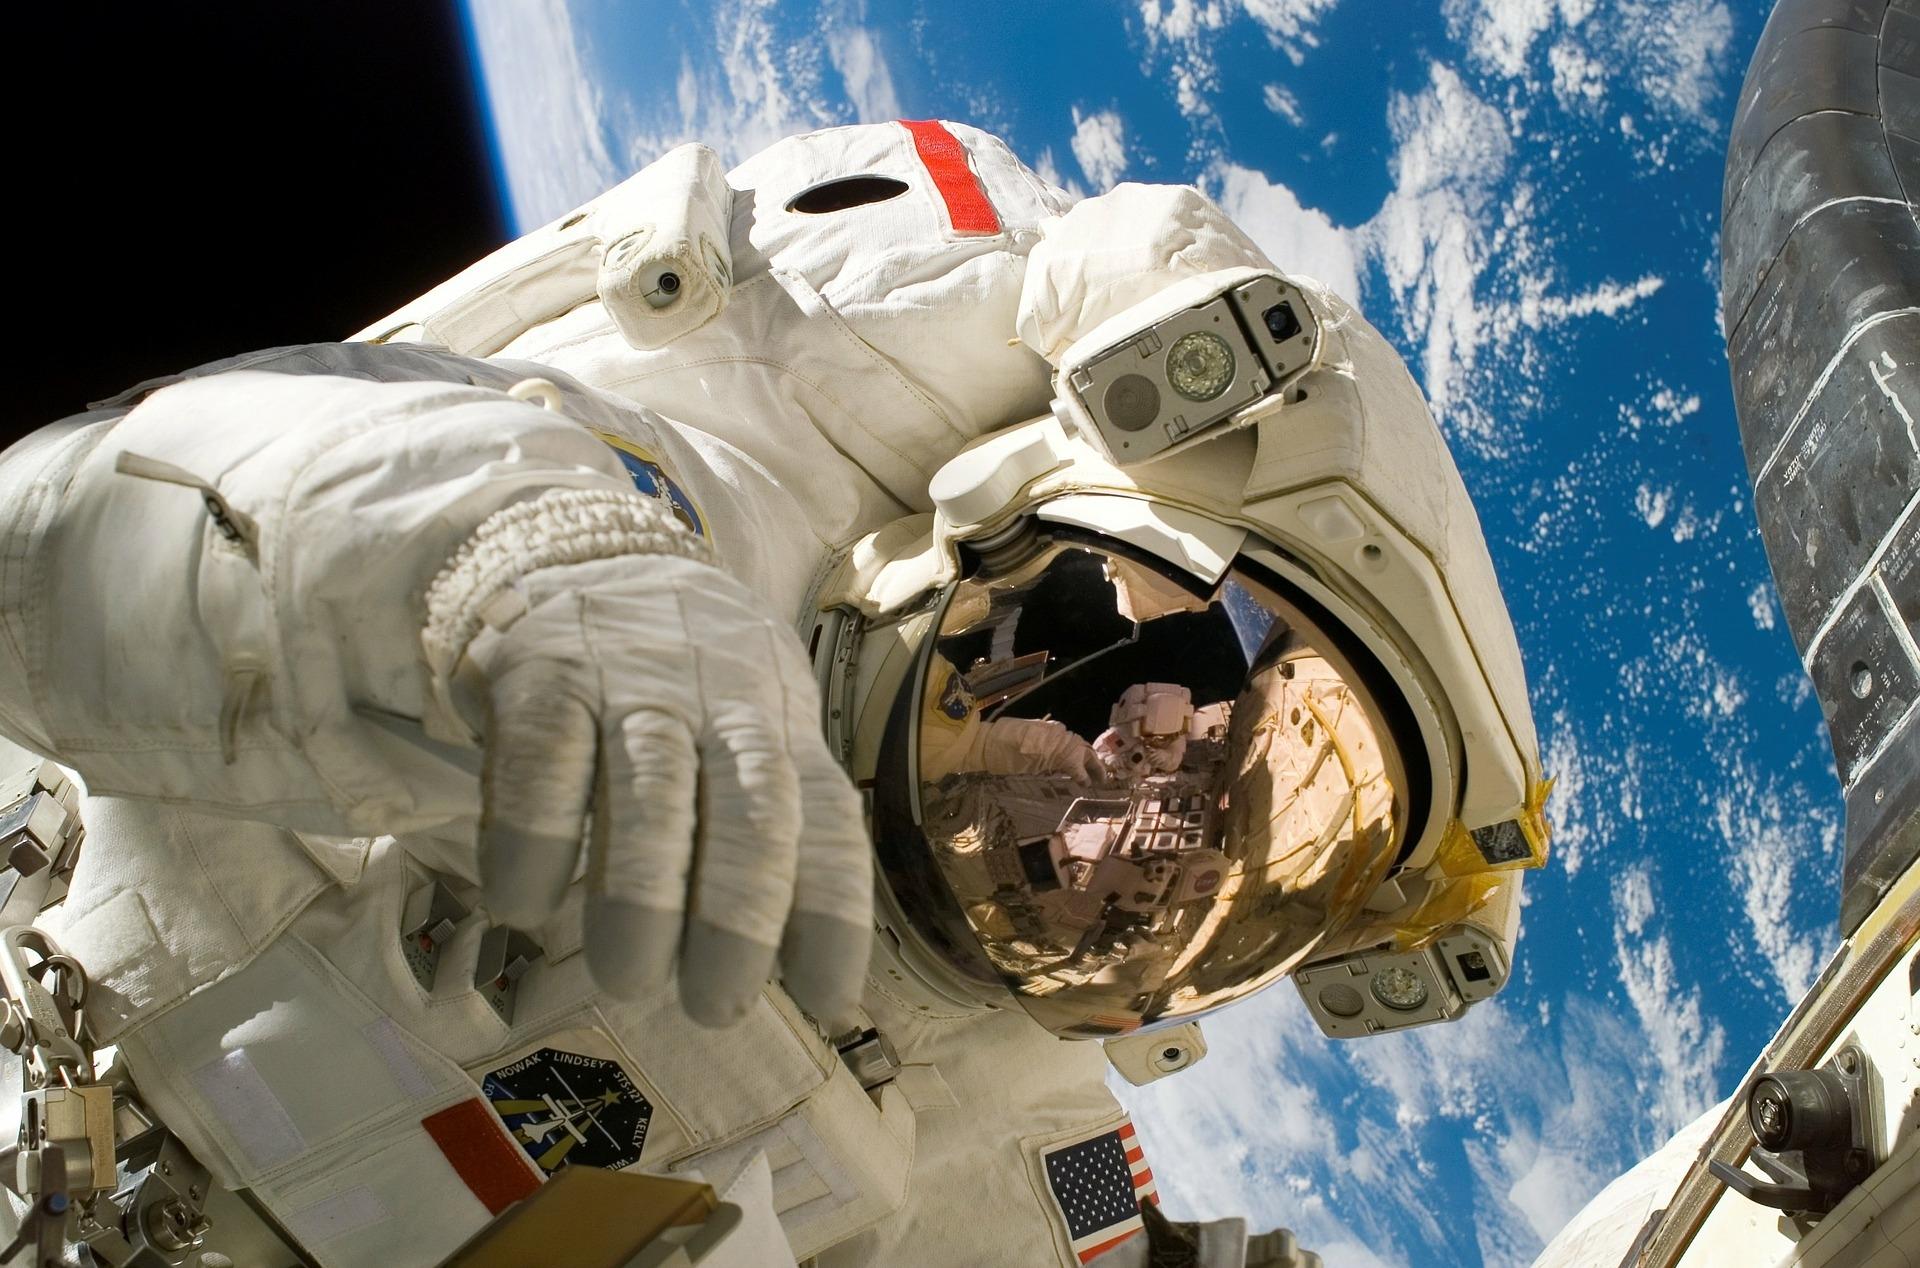 astronaut-11080_1920.jpg